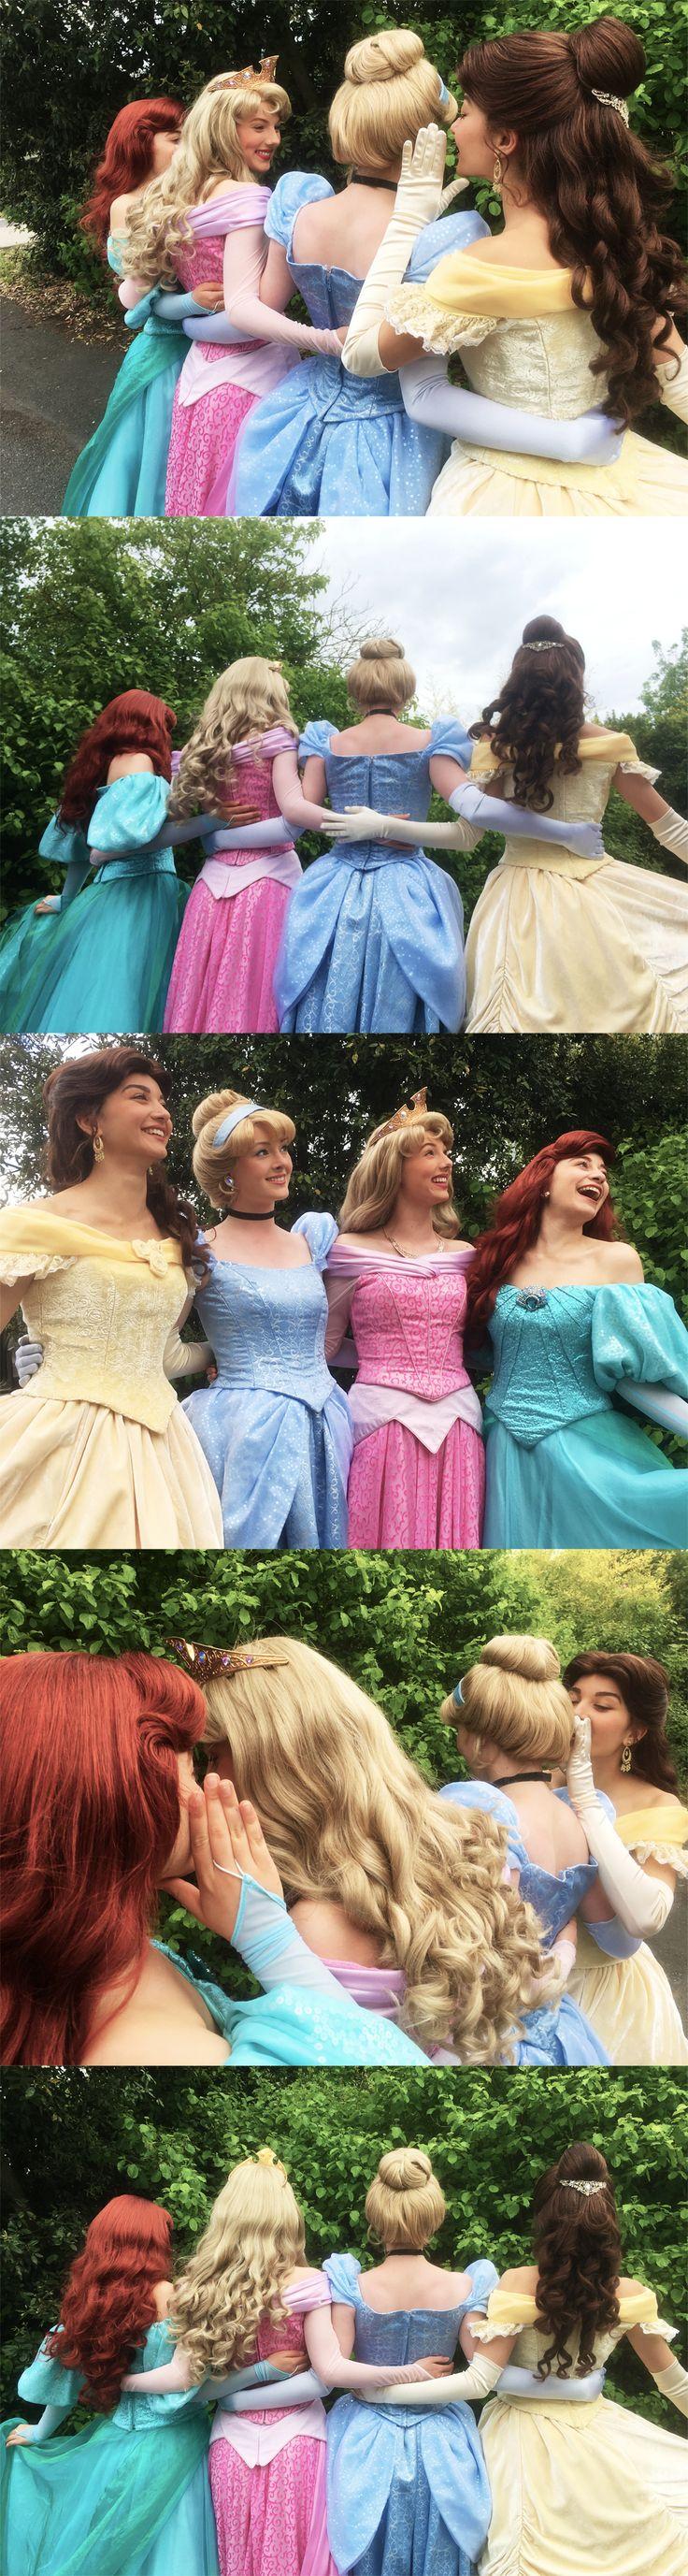 Disney Princesses Cinderella Aurora Ariel Belle Beauty and the Beast Sleeping Beauty The Little Mermaid Disneyland Paris Face Characters Royal Friends Rainbow Pastel.